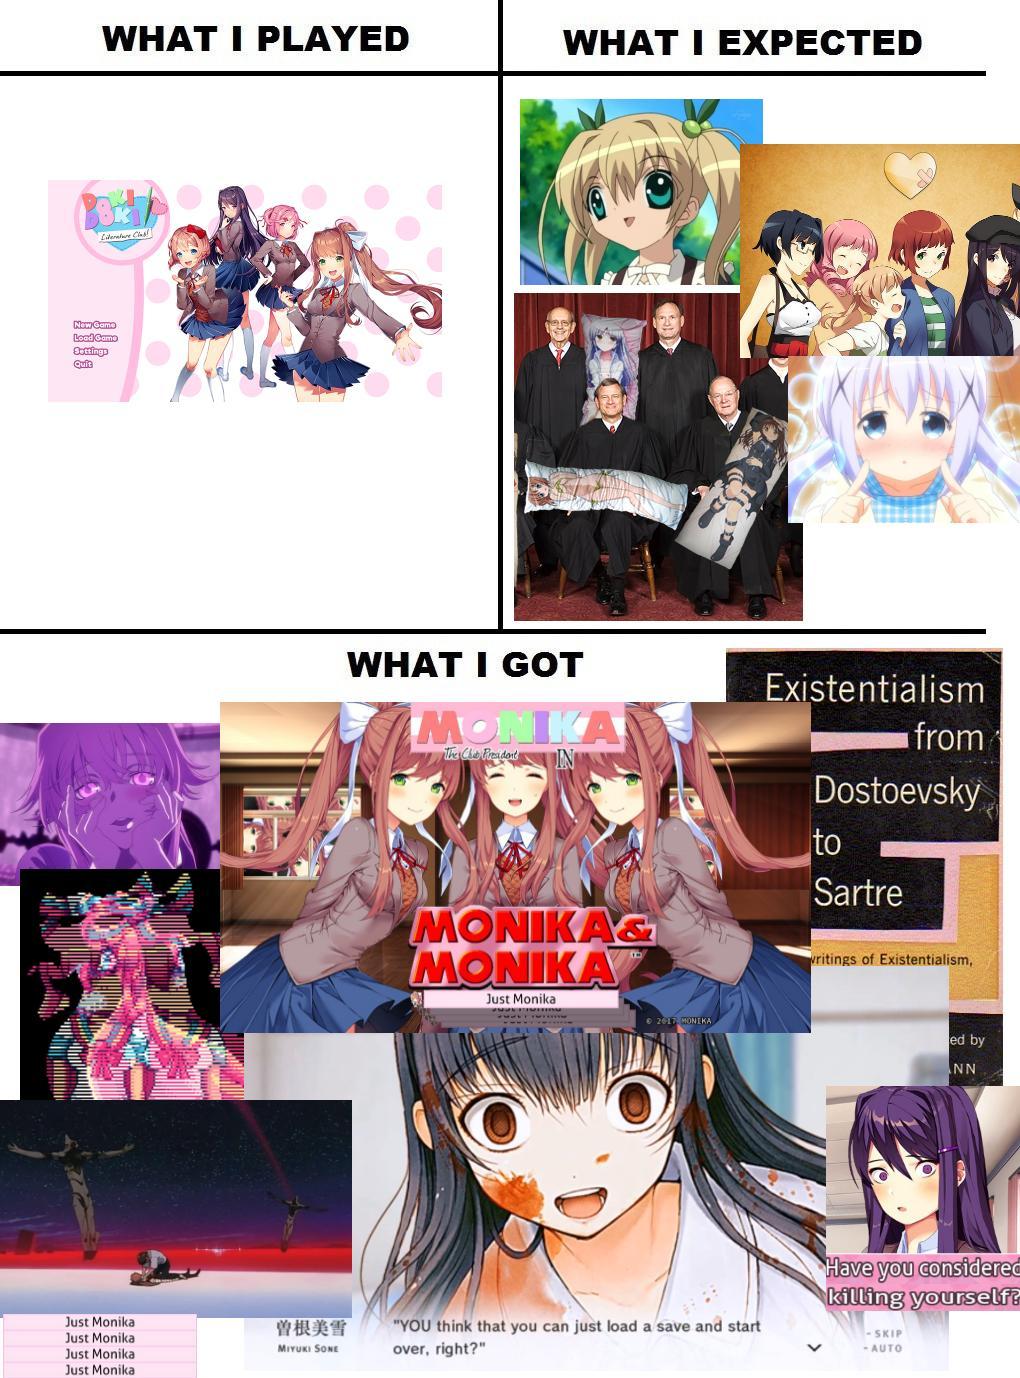 Doki Literature Club Ddlc Monika Sayori Meme Parody Auto L5740 Kubota Wiring Diagram Pretty Accurate